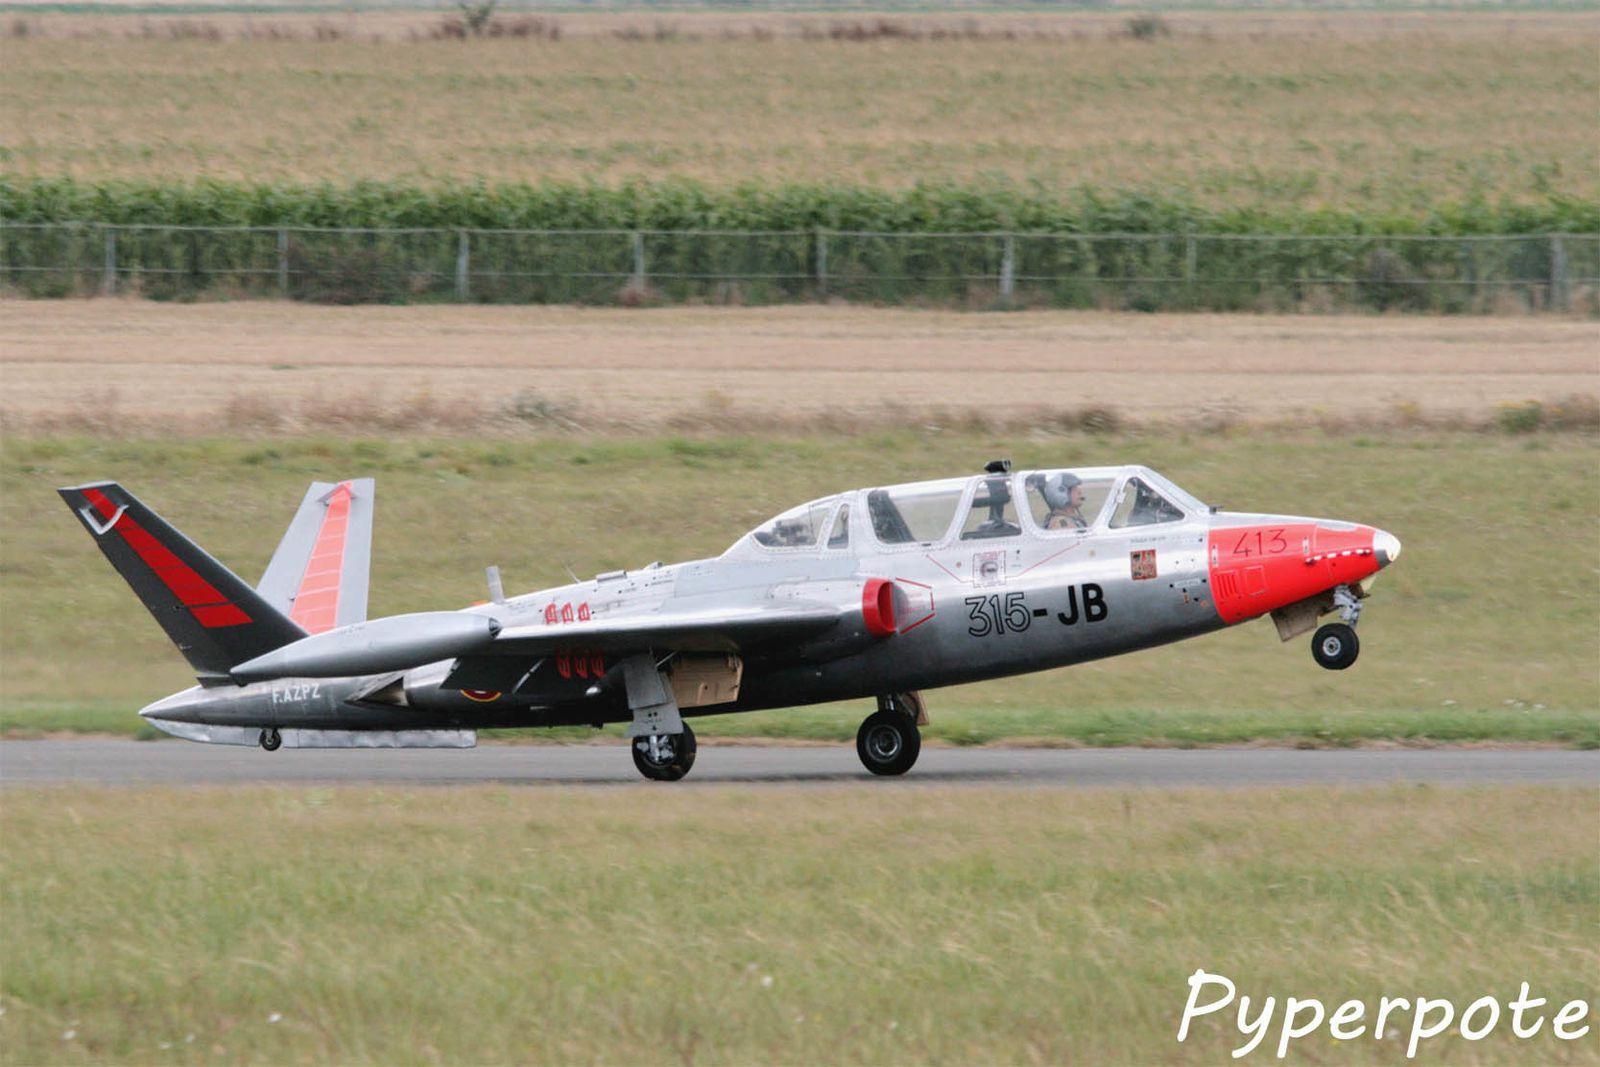 Le Fouga CM-170 Magister F-AZPZ  (photo Pyperpote)